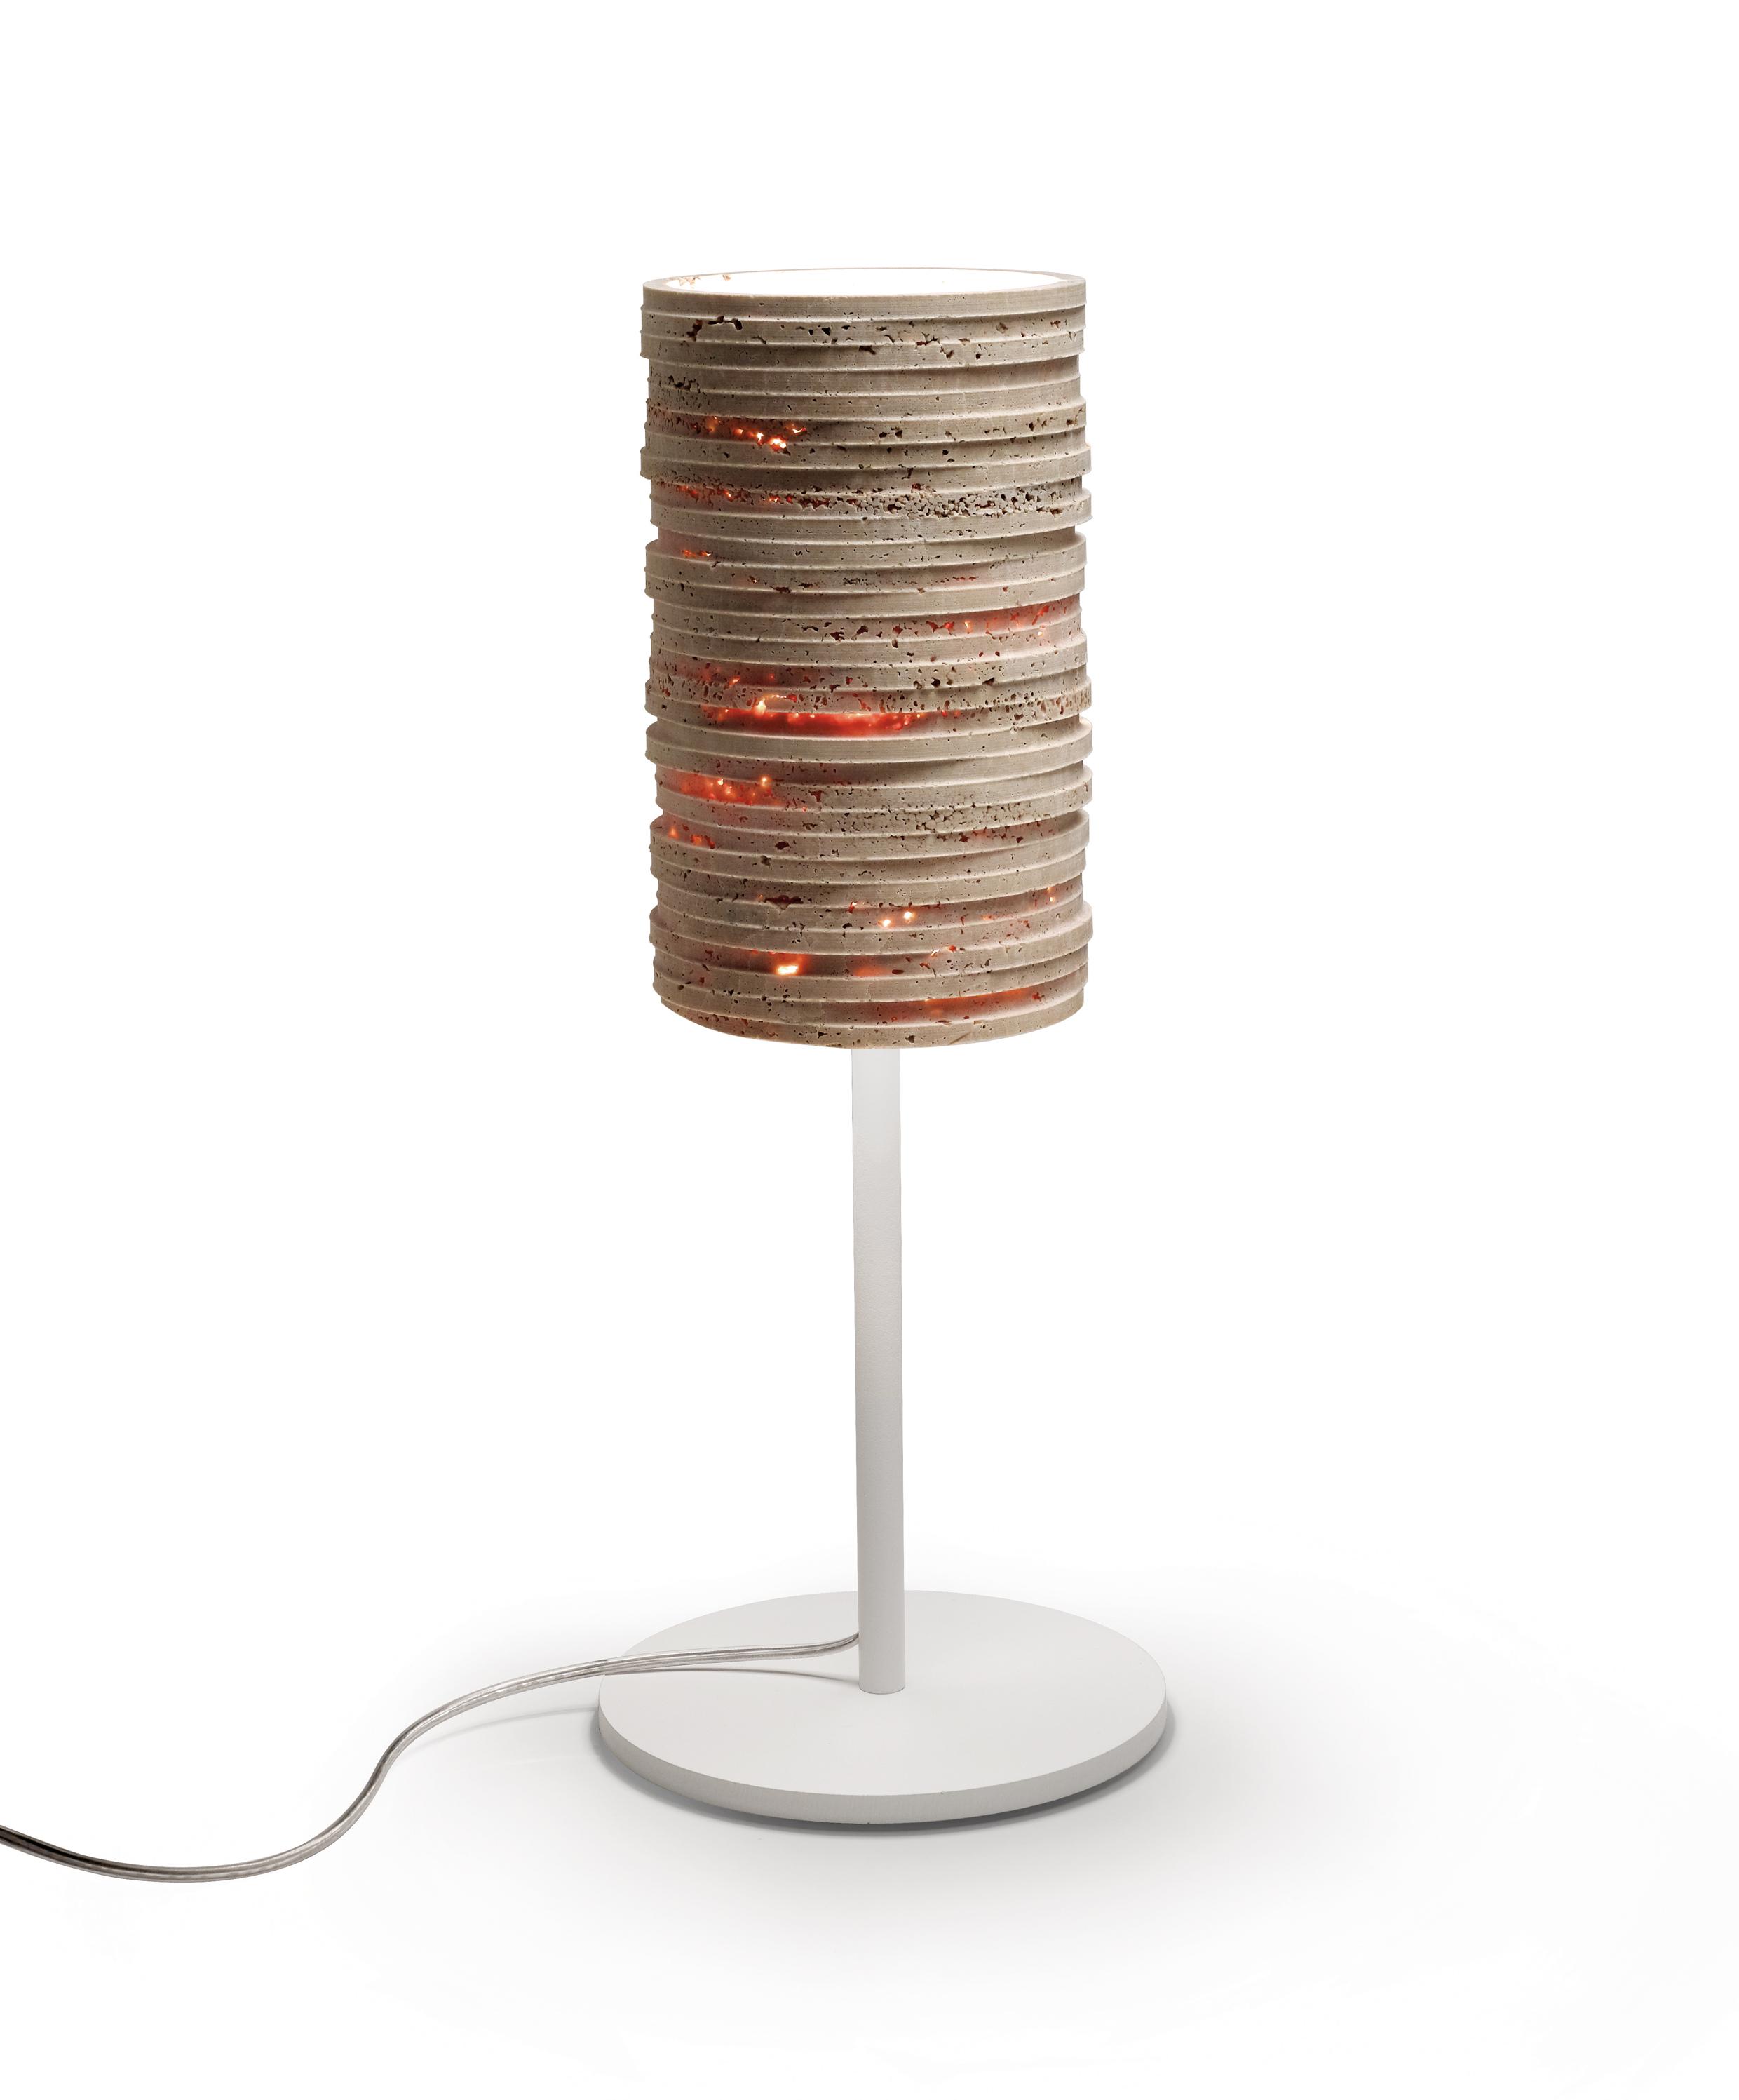 Lampe Strato Stehlampe aus Travertin